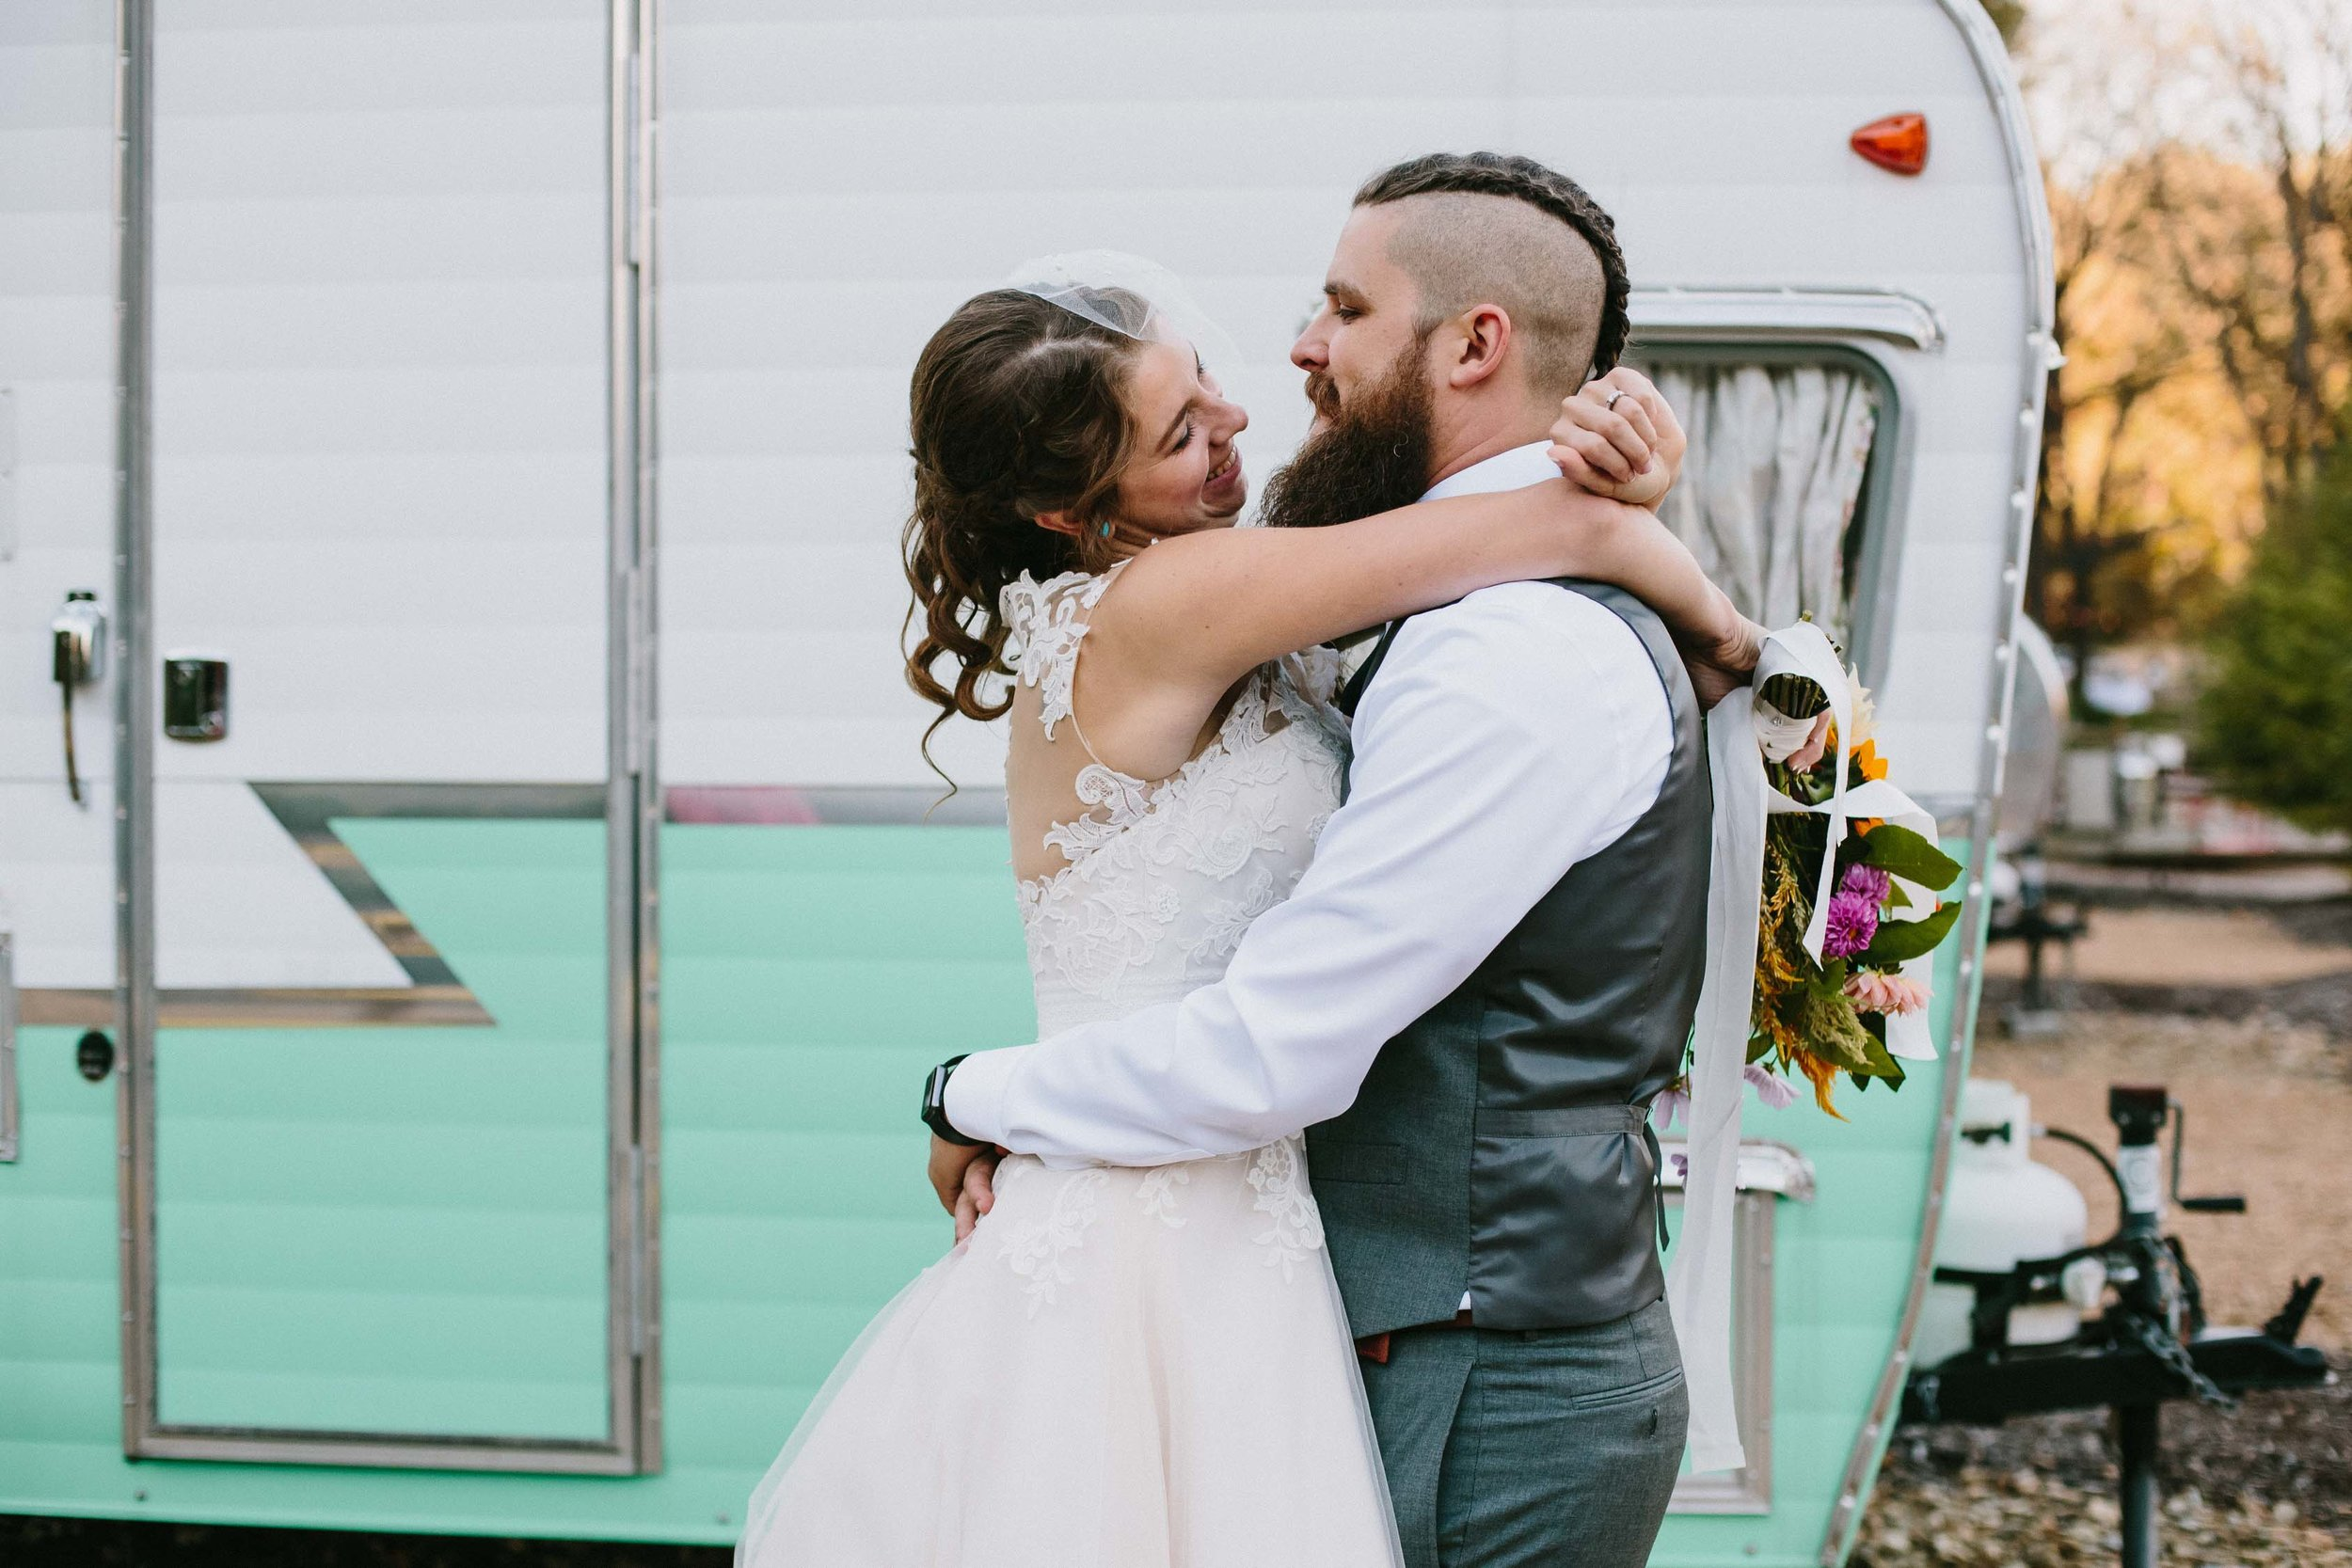 Angeli_Joe__Asheville_Wedding-63.jpg